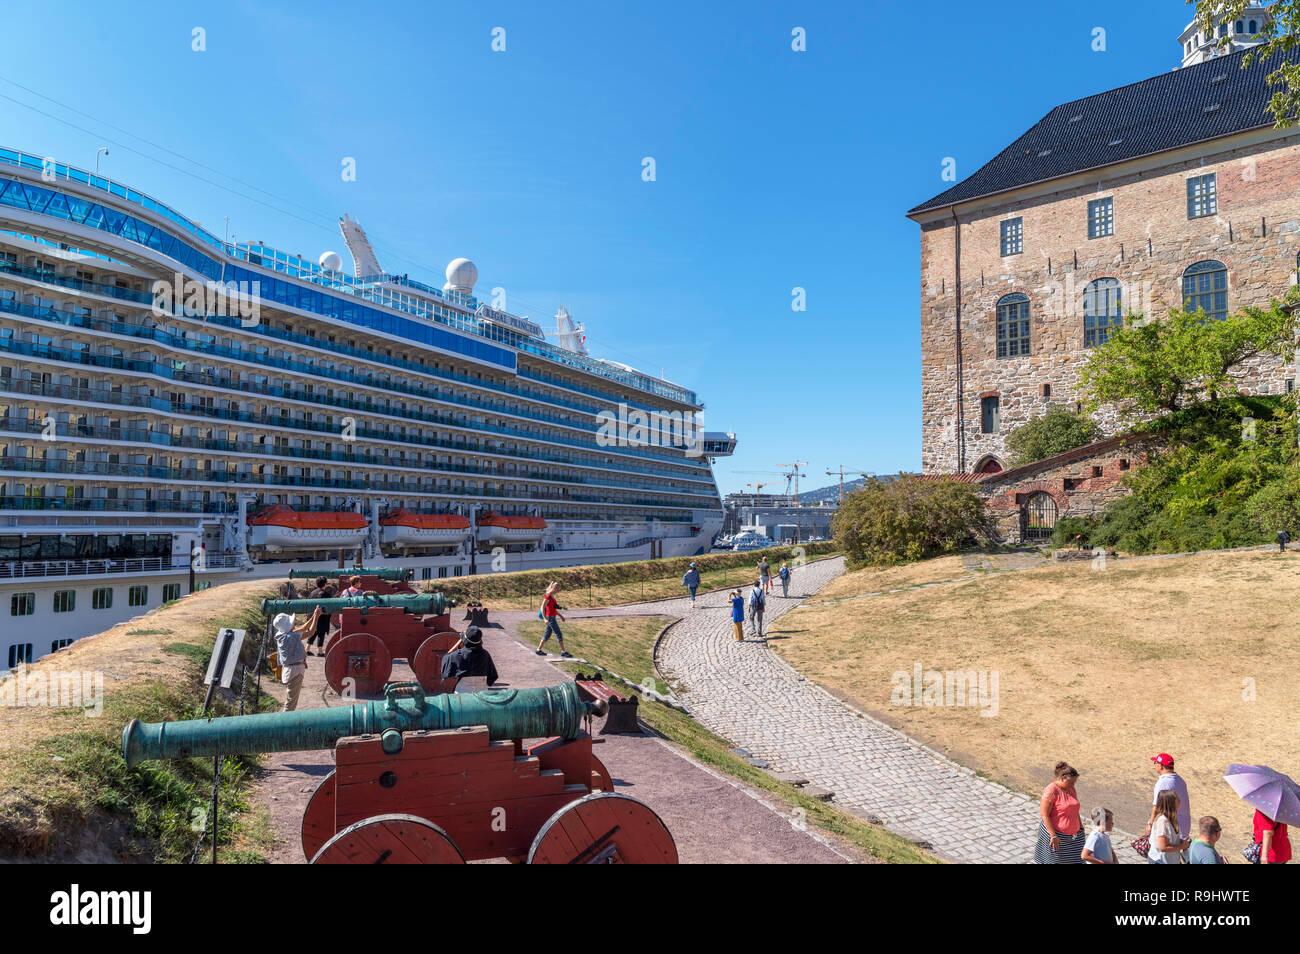 Regal Princess cruise liner in front of Akershus Fortress (Akershus Festning) and Akershus Castle (Akershus Slott), Oslo, Norway - Stock Image